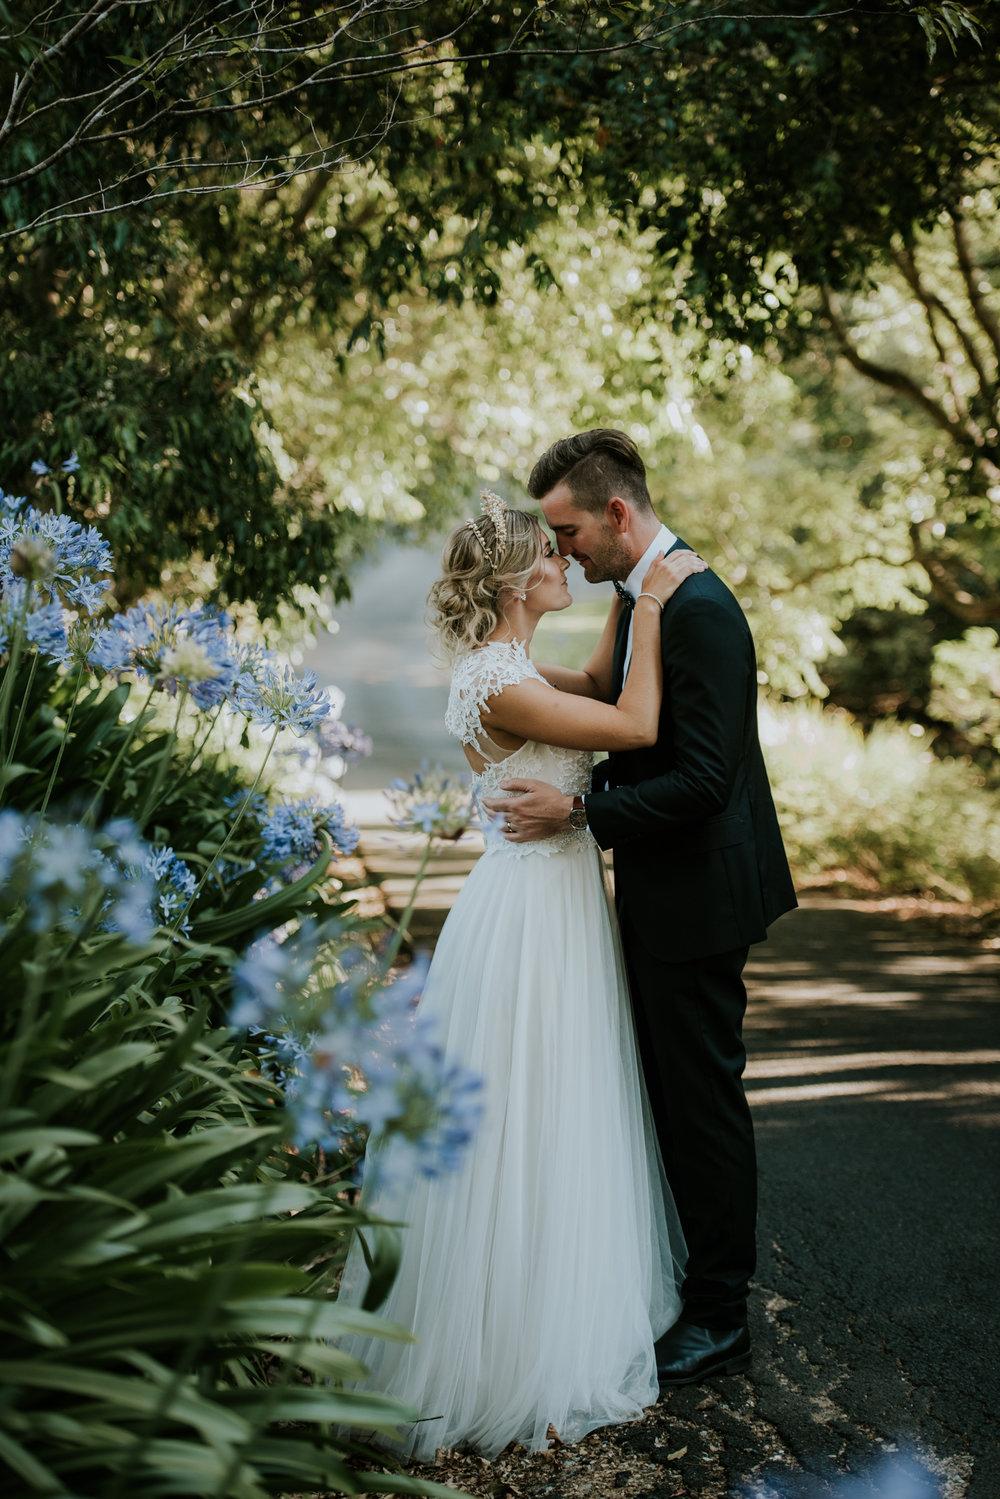 Byron Bay Wedding Photographer | Engagement-Elopement Photography-54.jpg